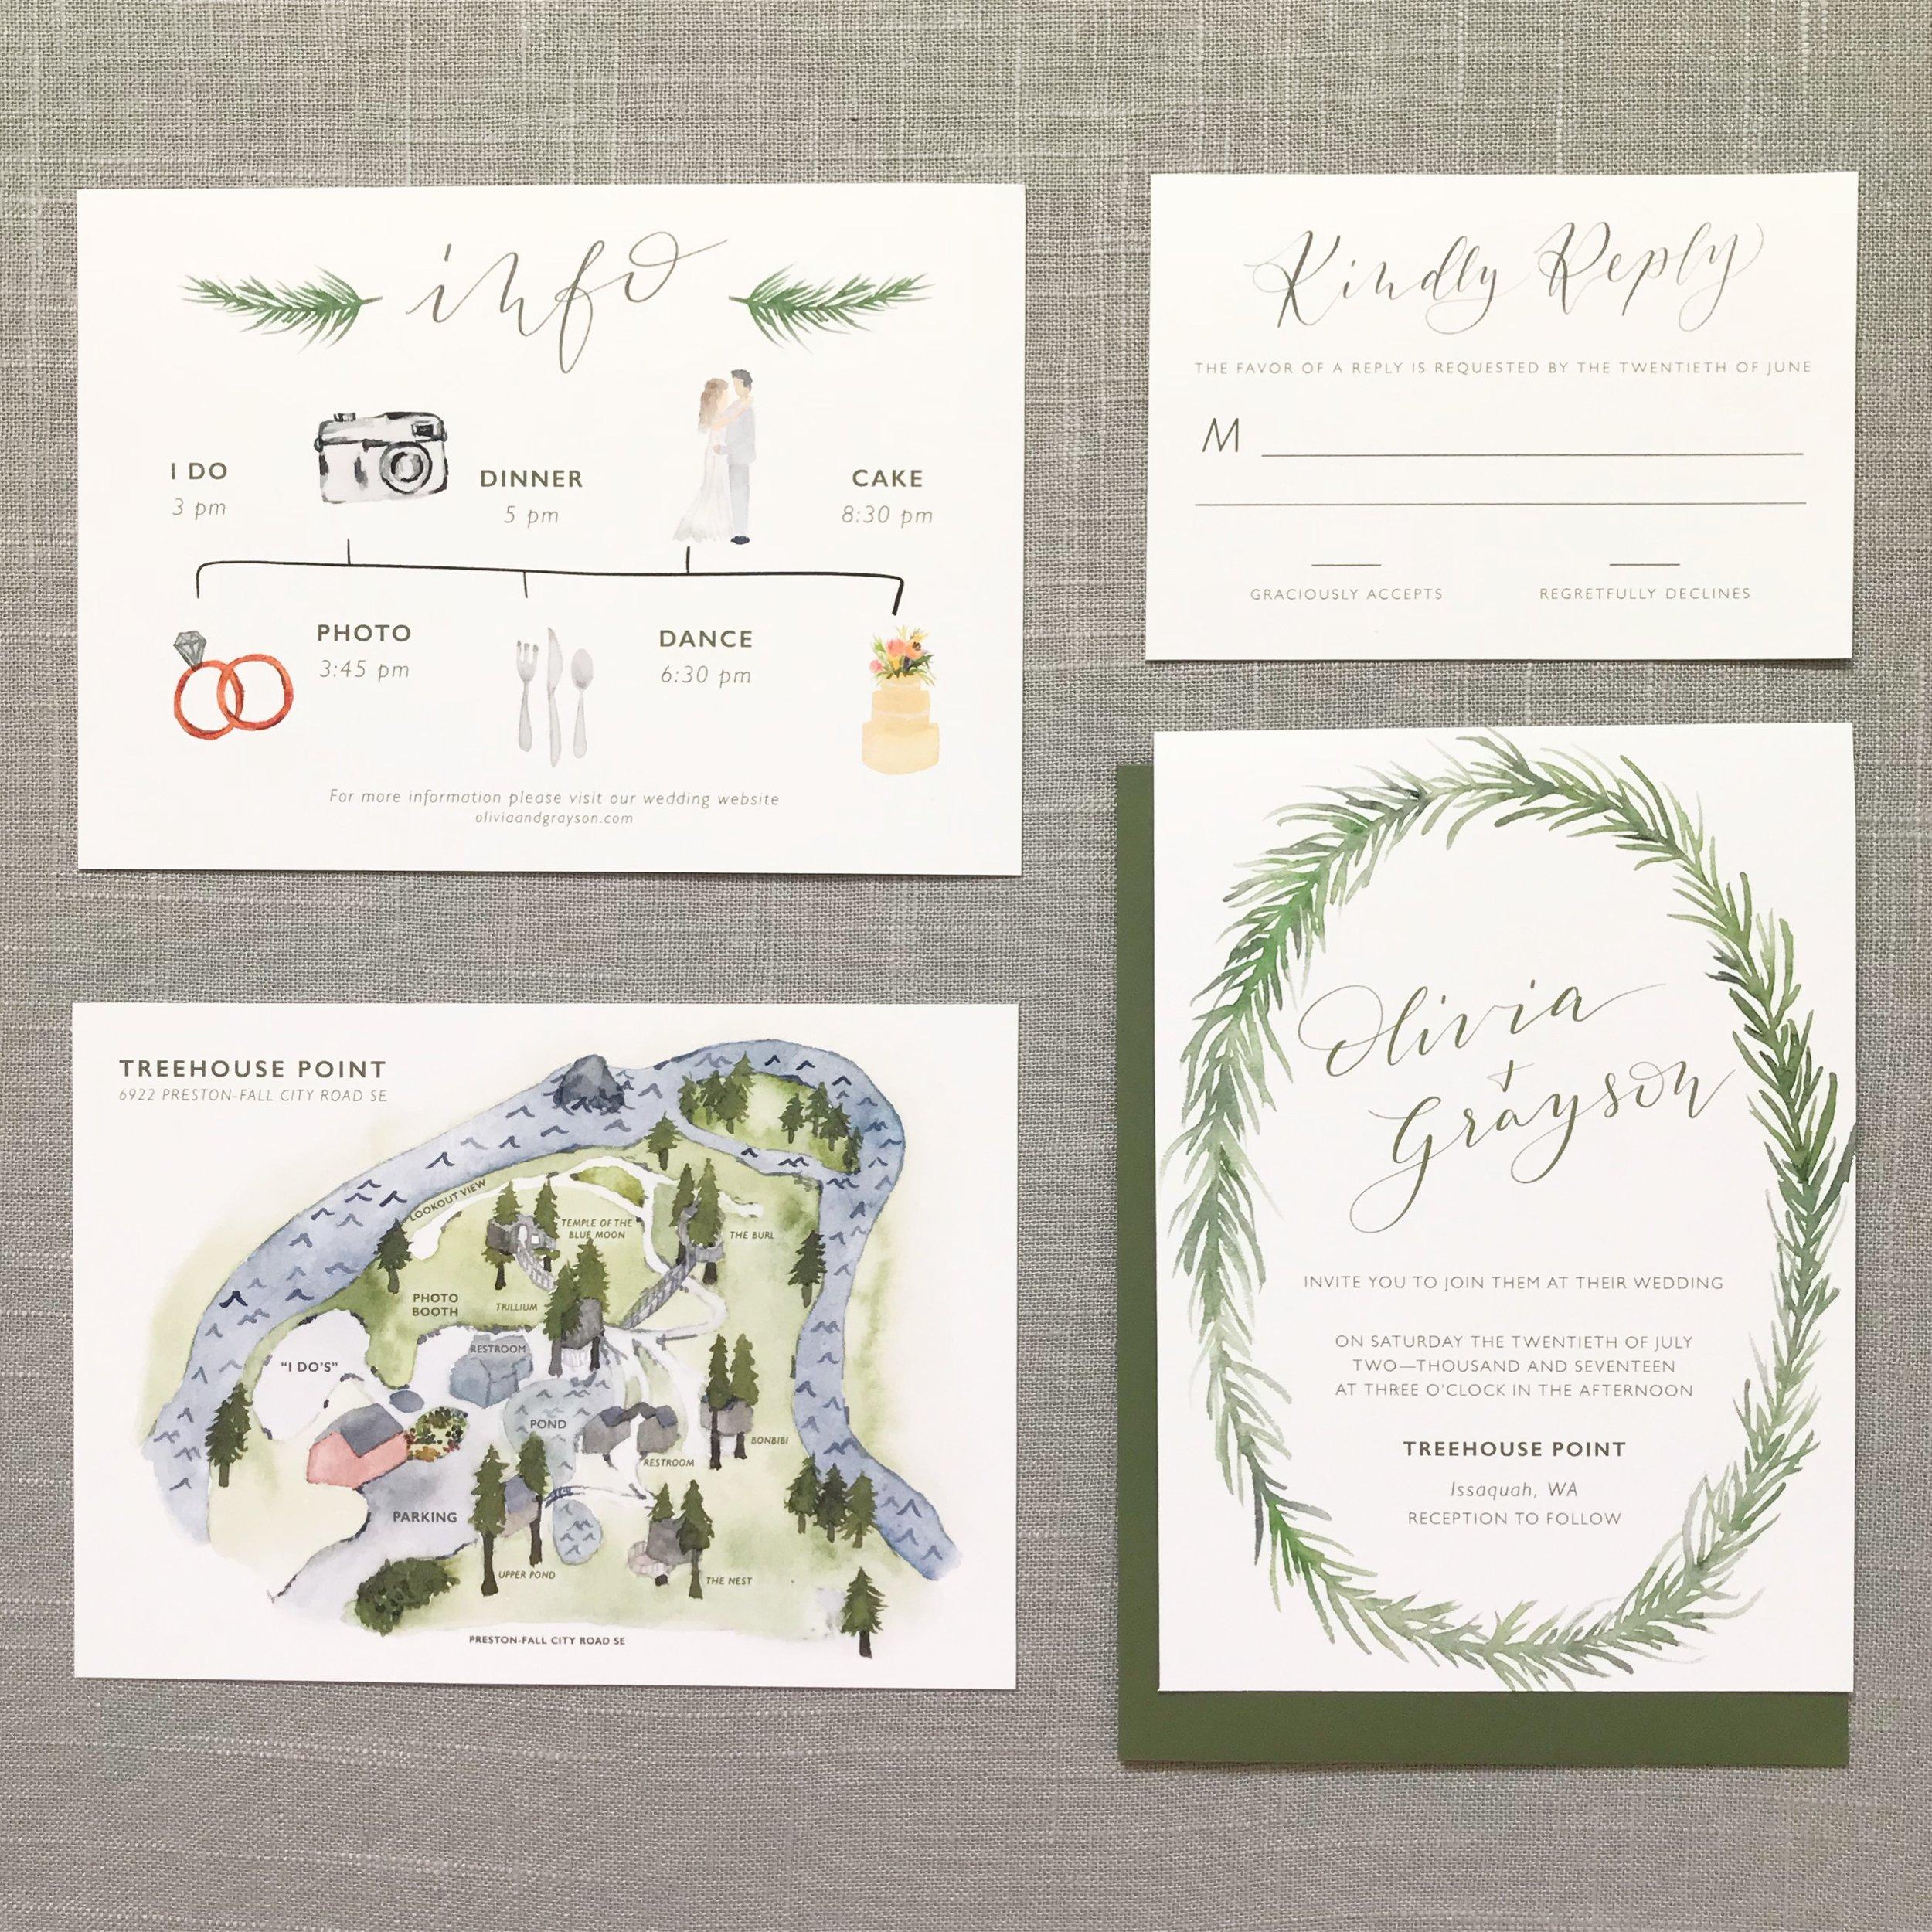 Our Vows Custom Wedding invitation